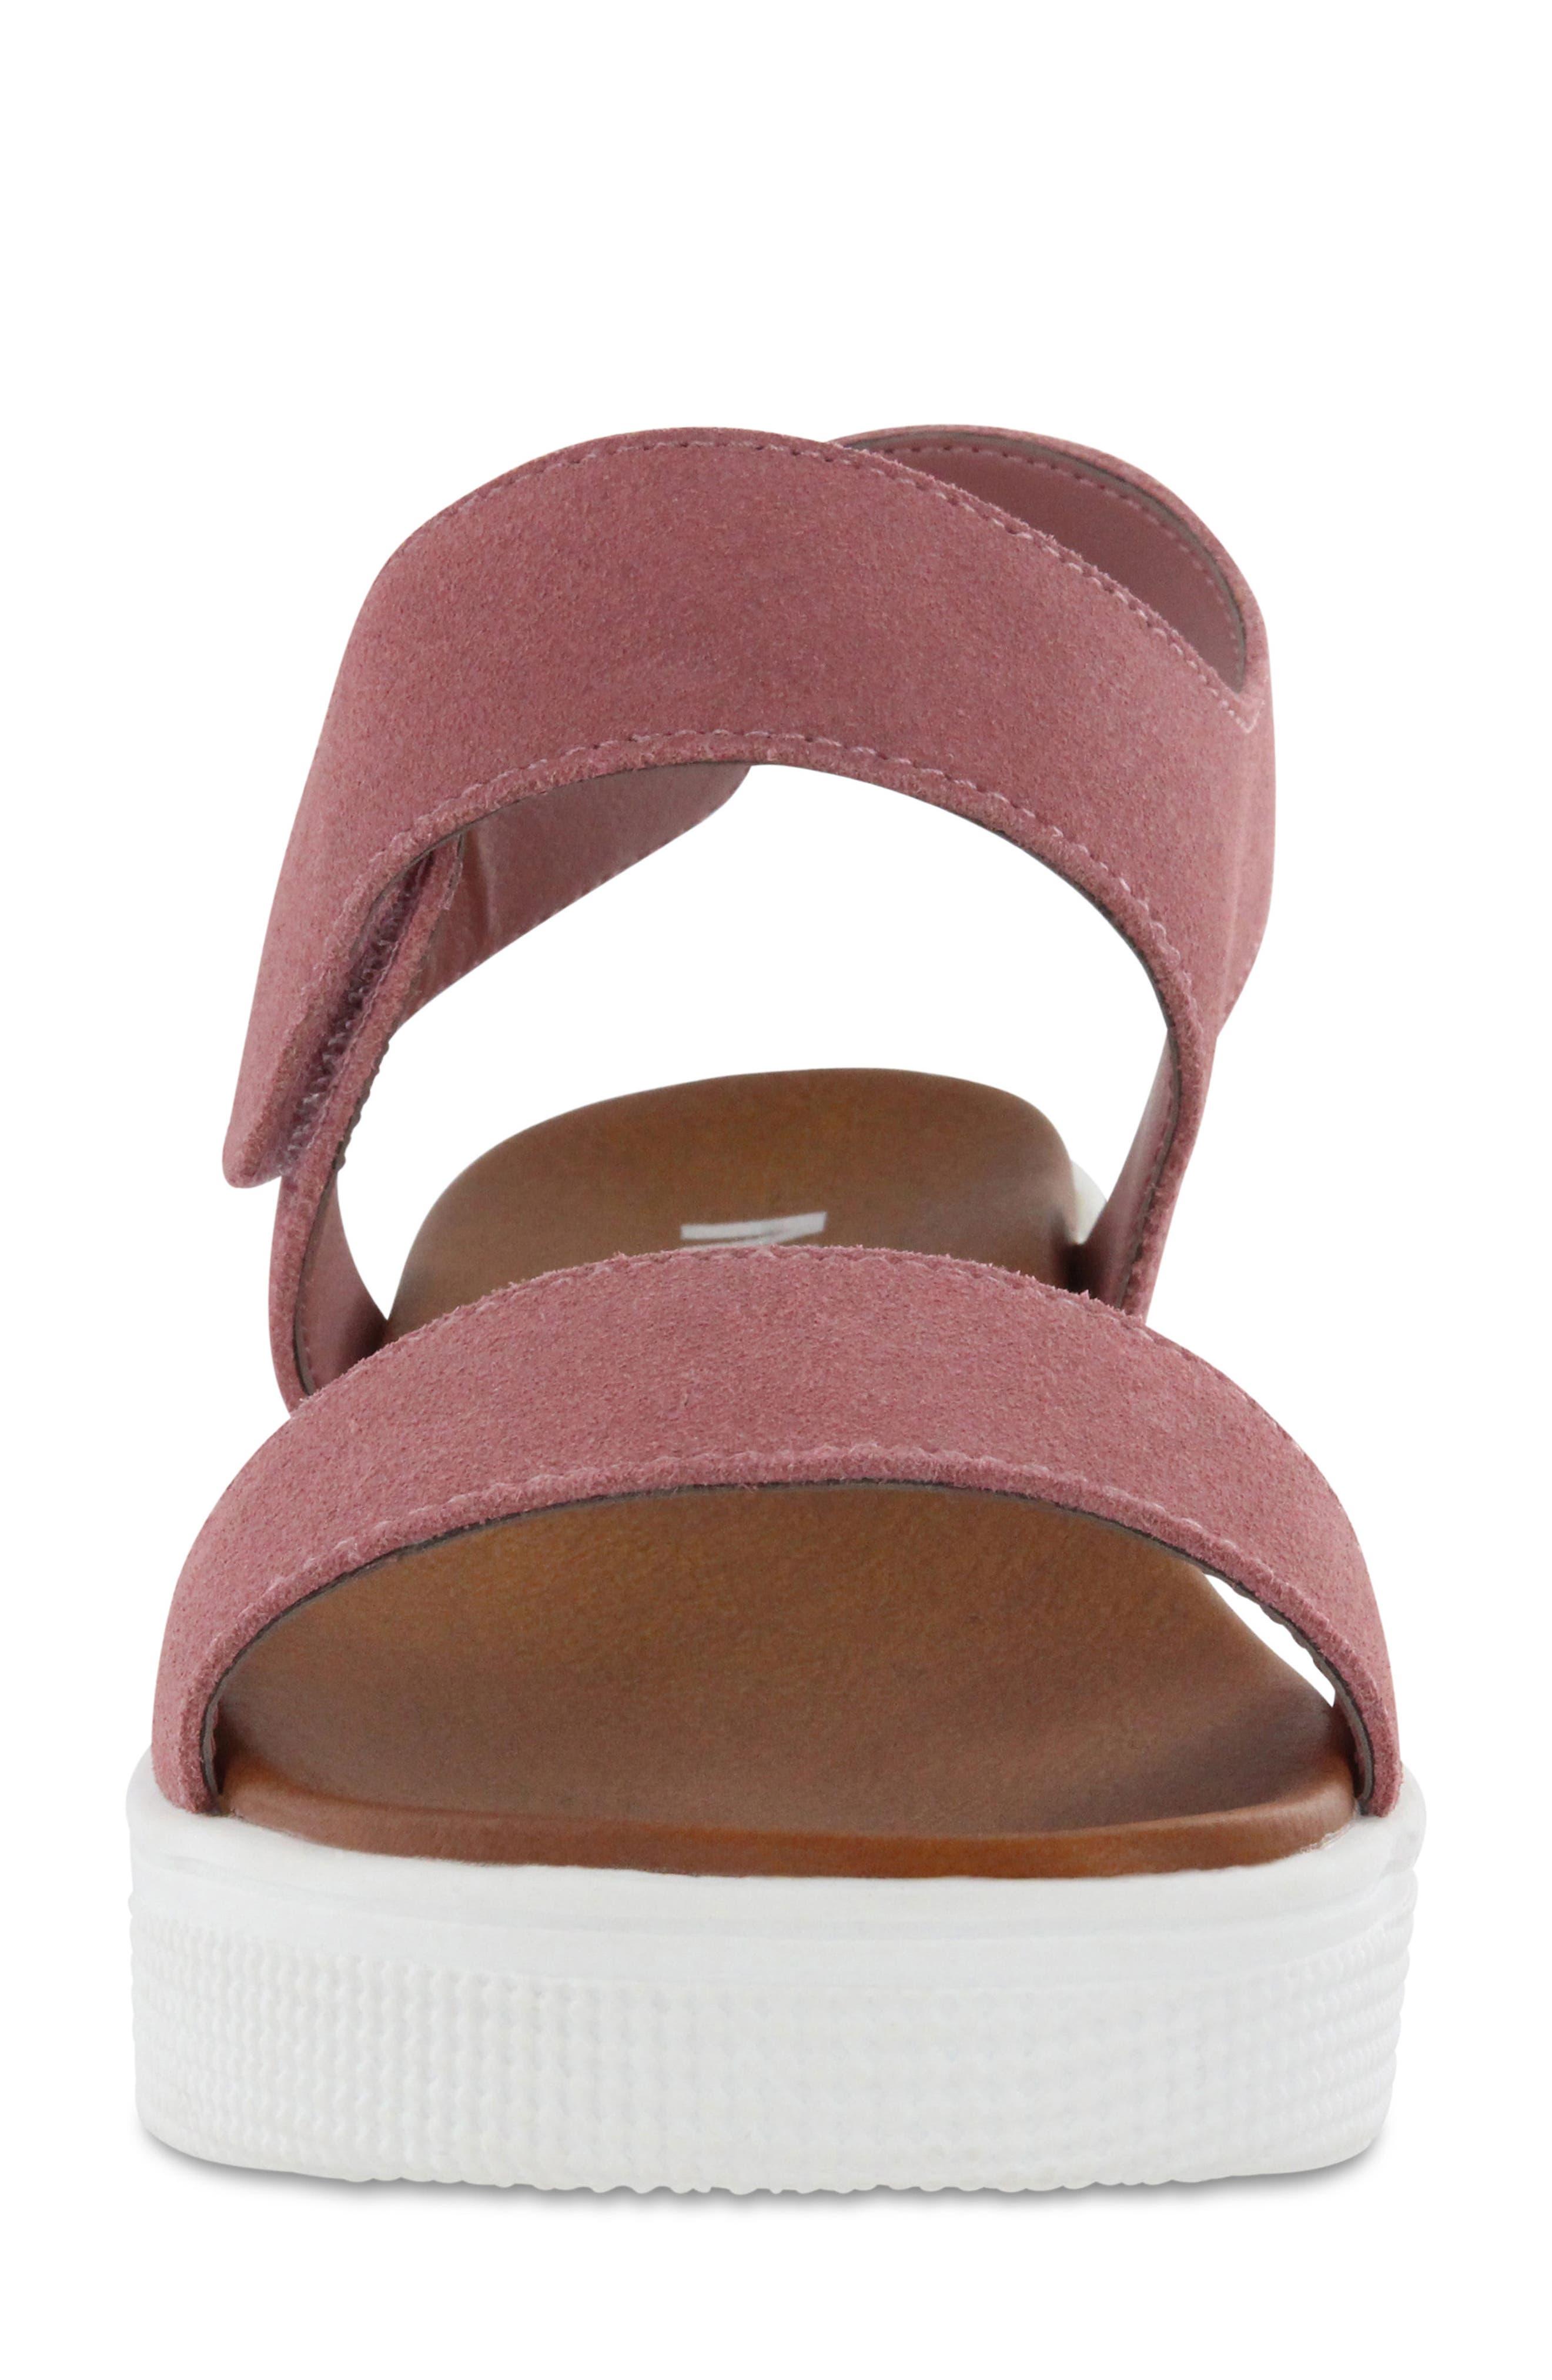 Troy Slingback Platform Sandal,                             Alternate thumbnail 4, color,                             Mauve Suede